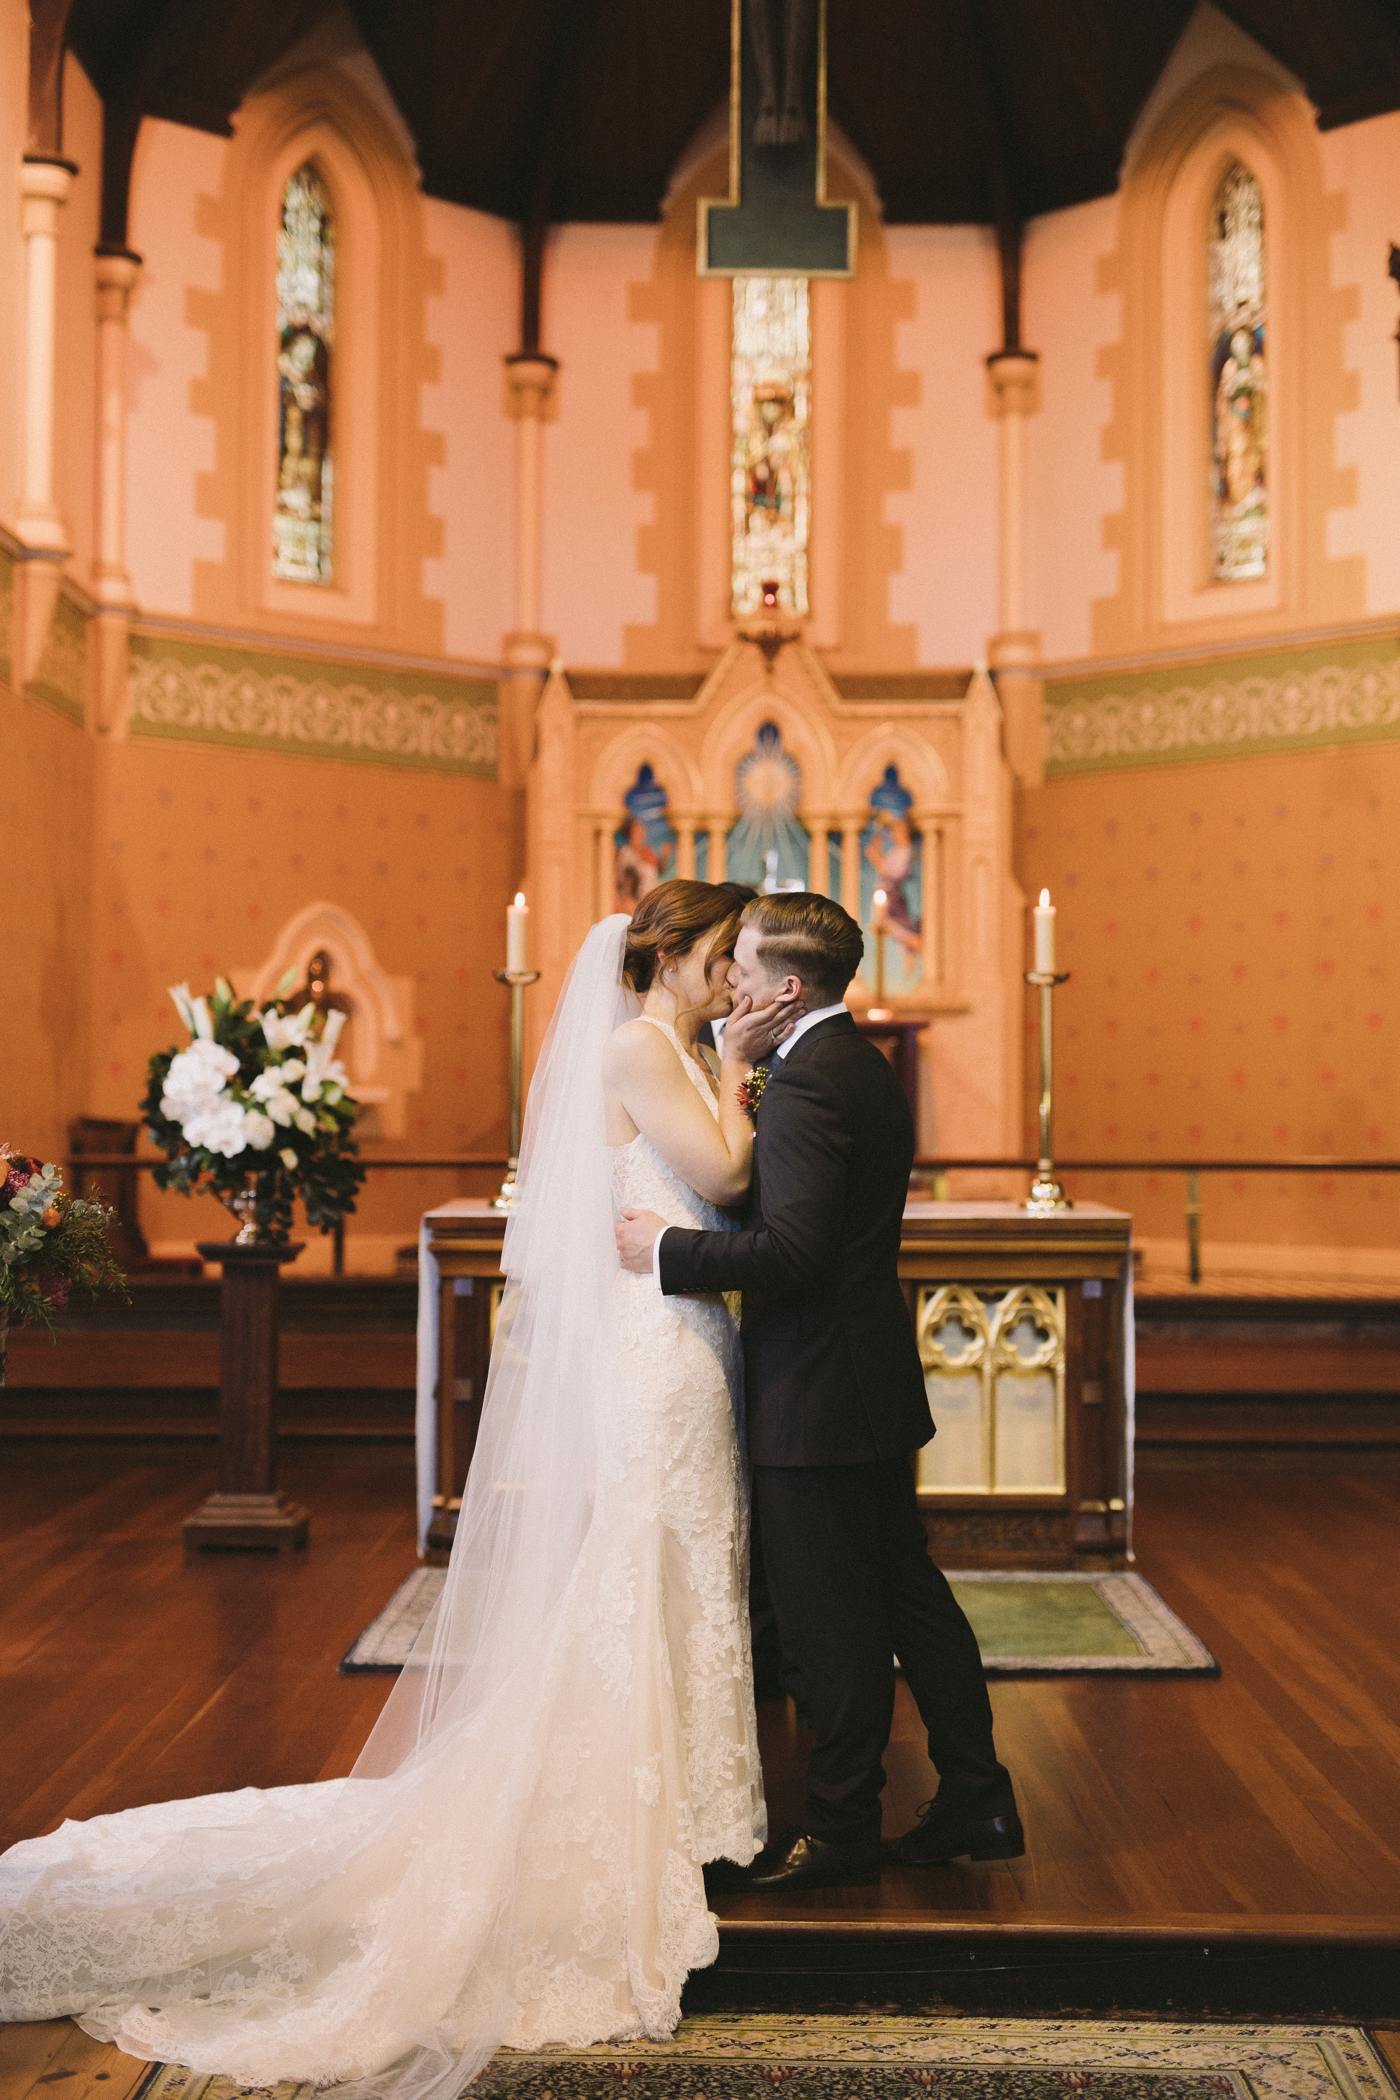 Erin & Ryan - Natural Wedding Photographer in Adelaide - Maximillians Wedding - Simple and Modern Wedding Photographer - Katherine Schultz - www.katherineschultzphotography.com_0023.jpg